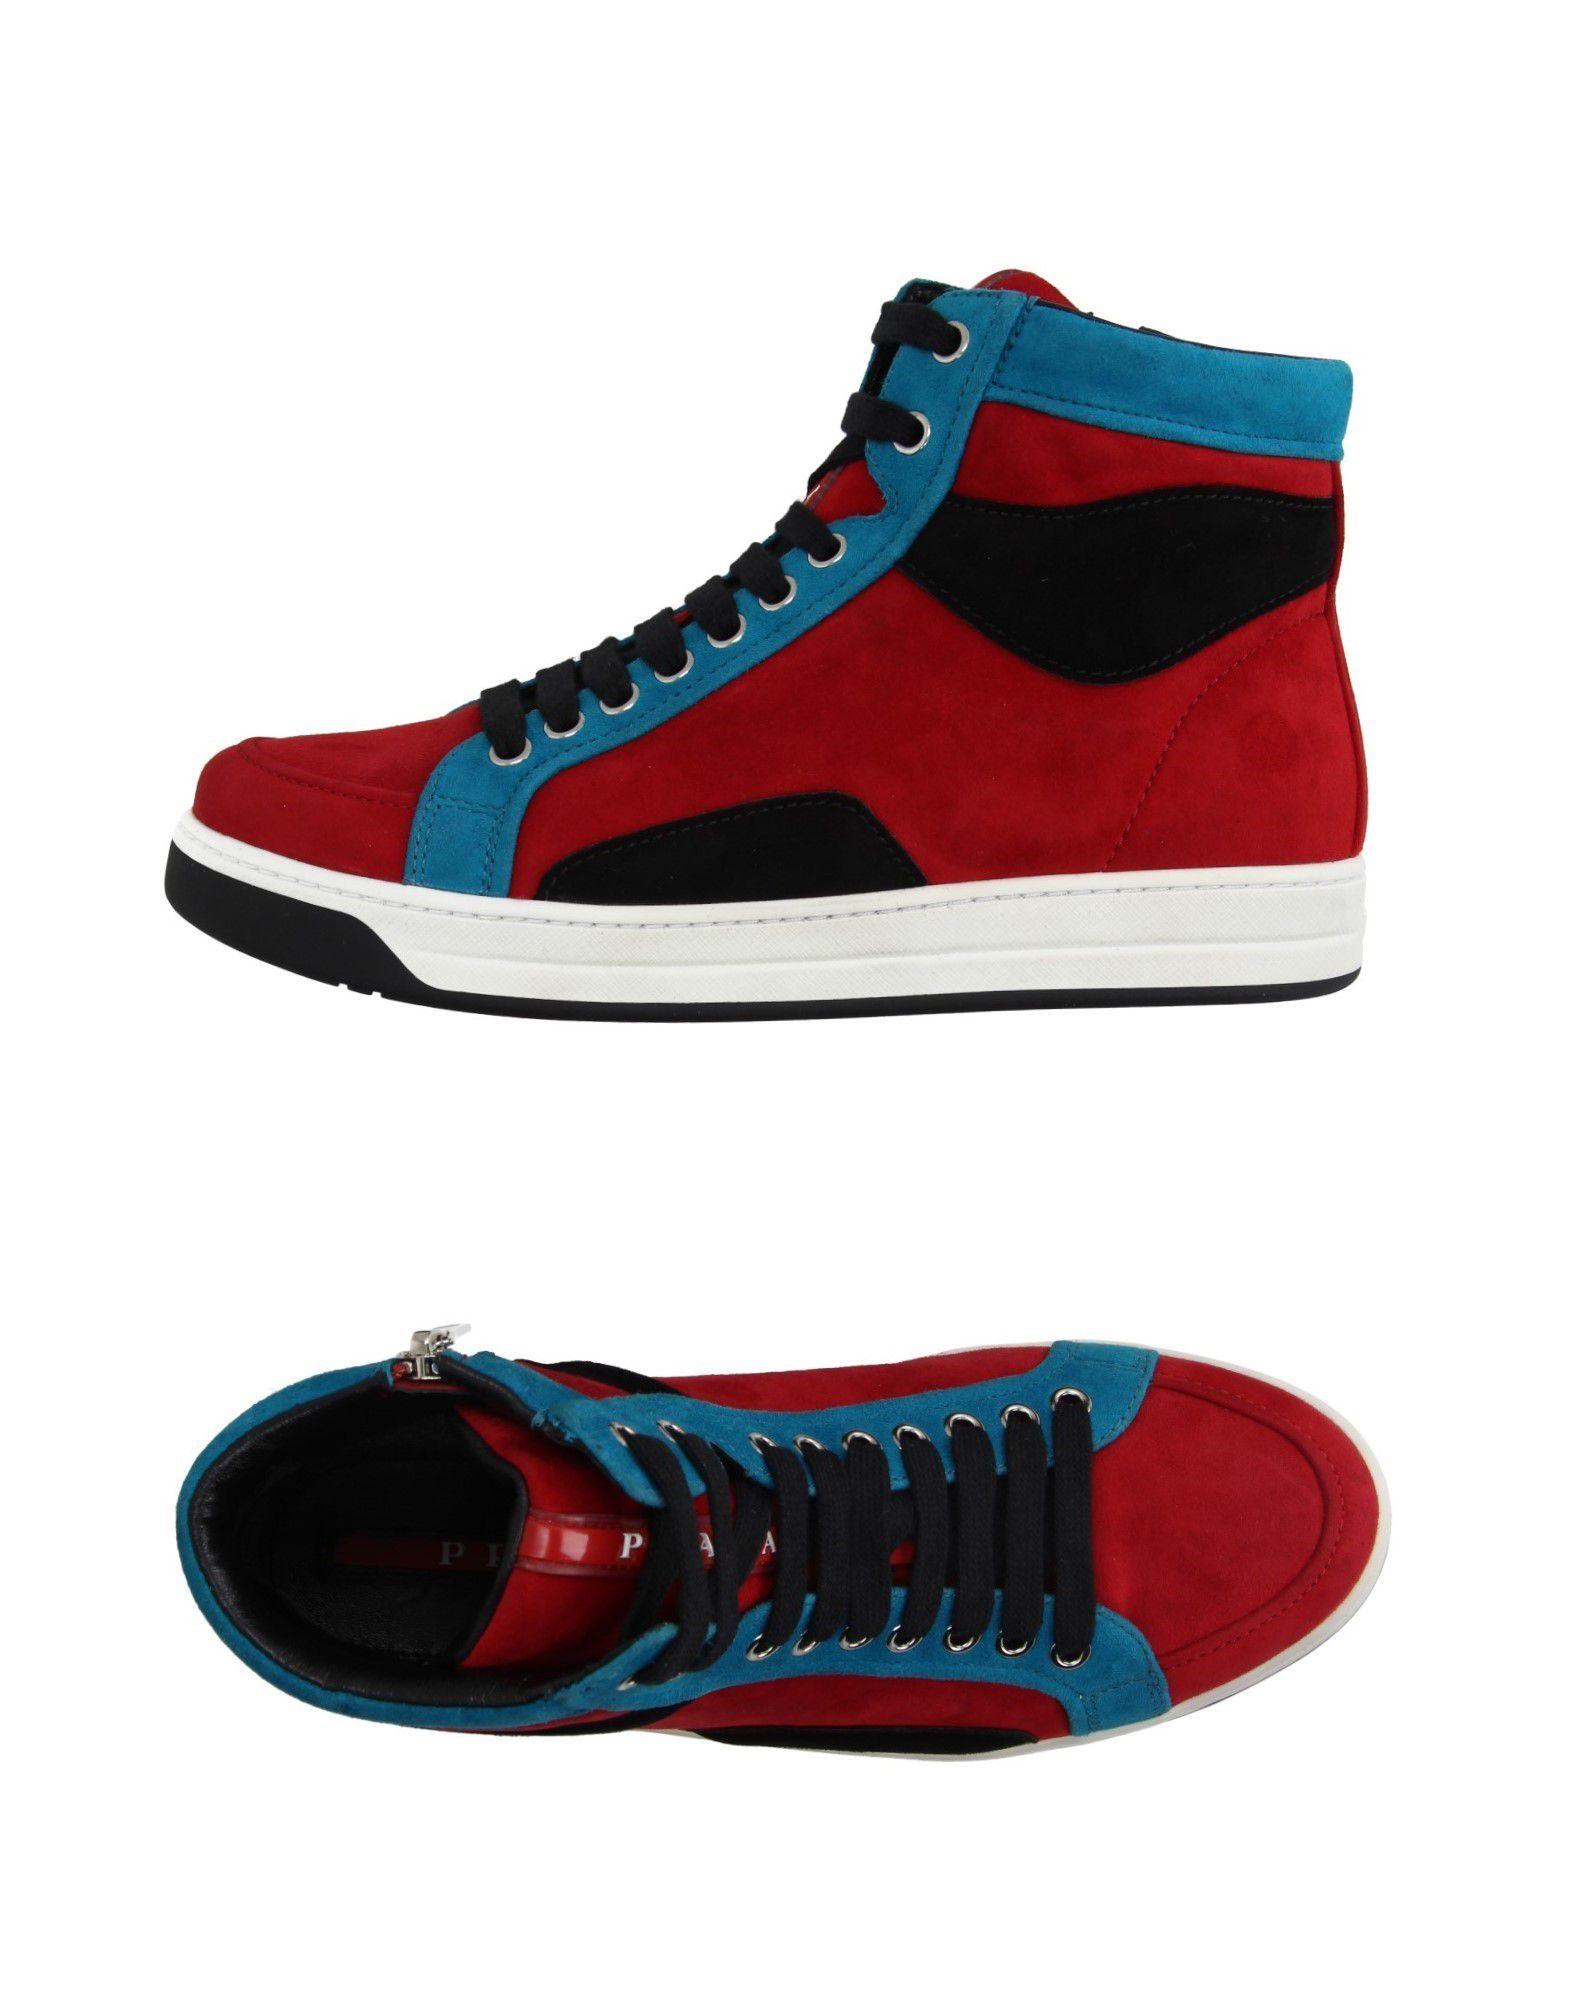 Rabatt Schuhe Prada Sport Sneakers Damen  11013425DR